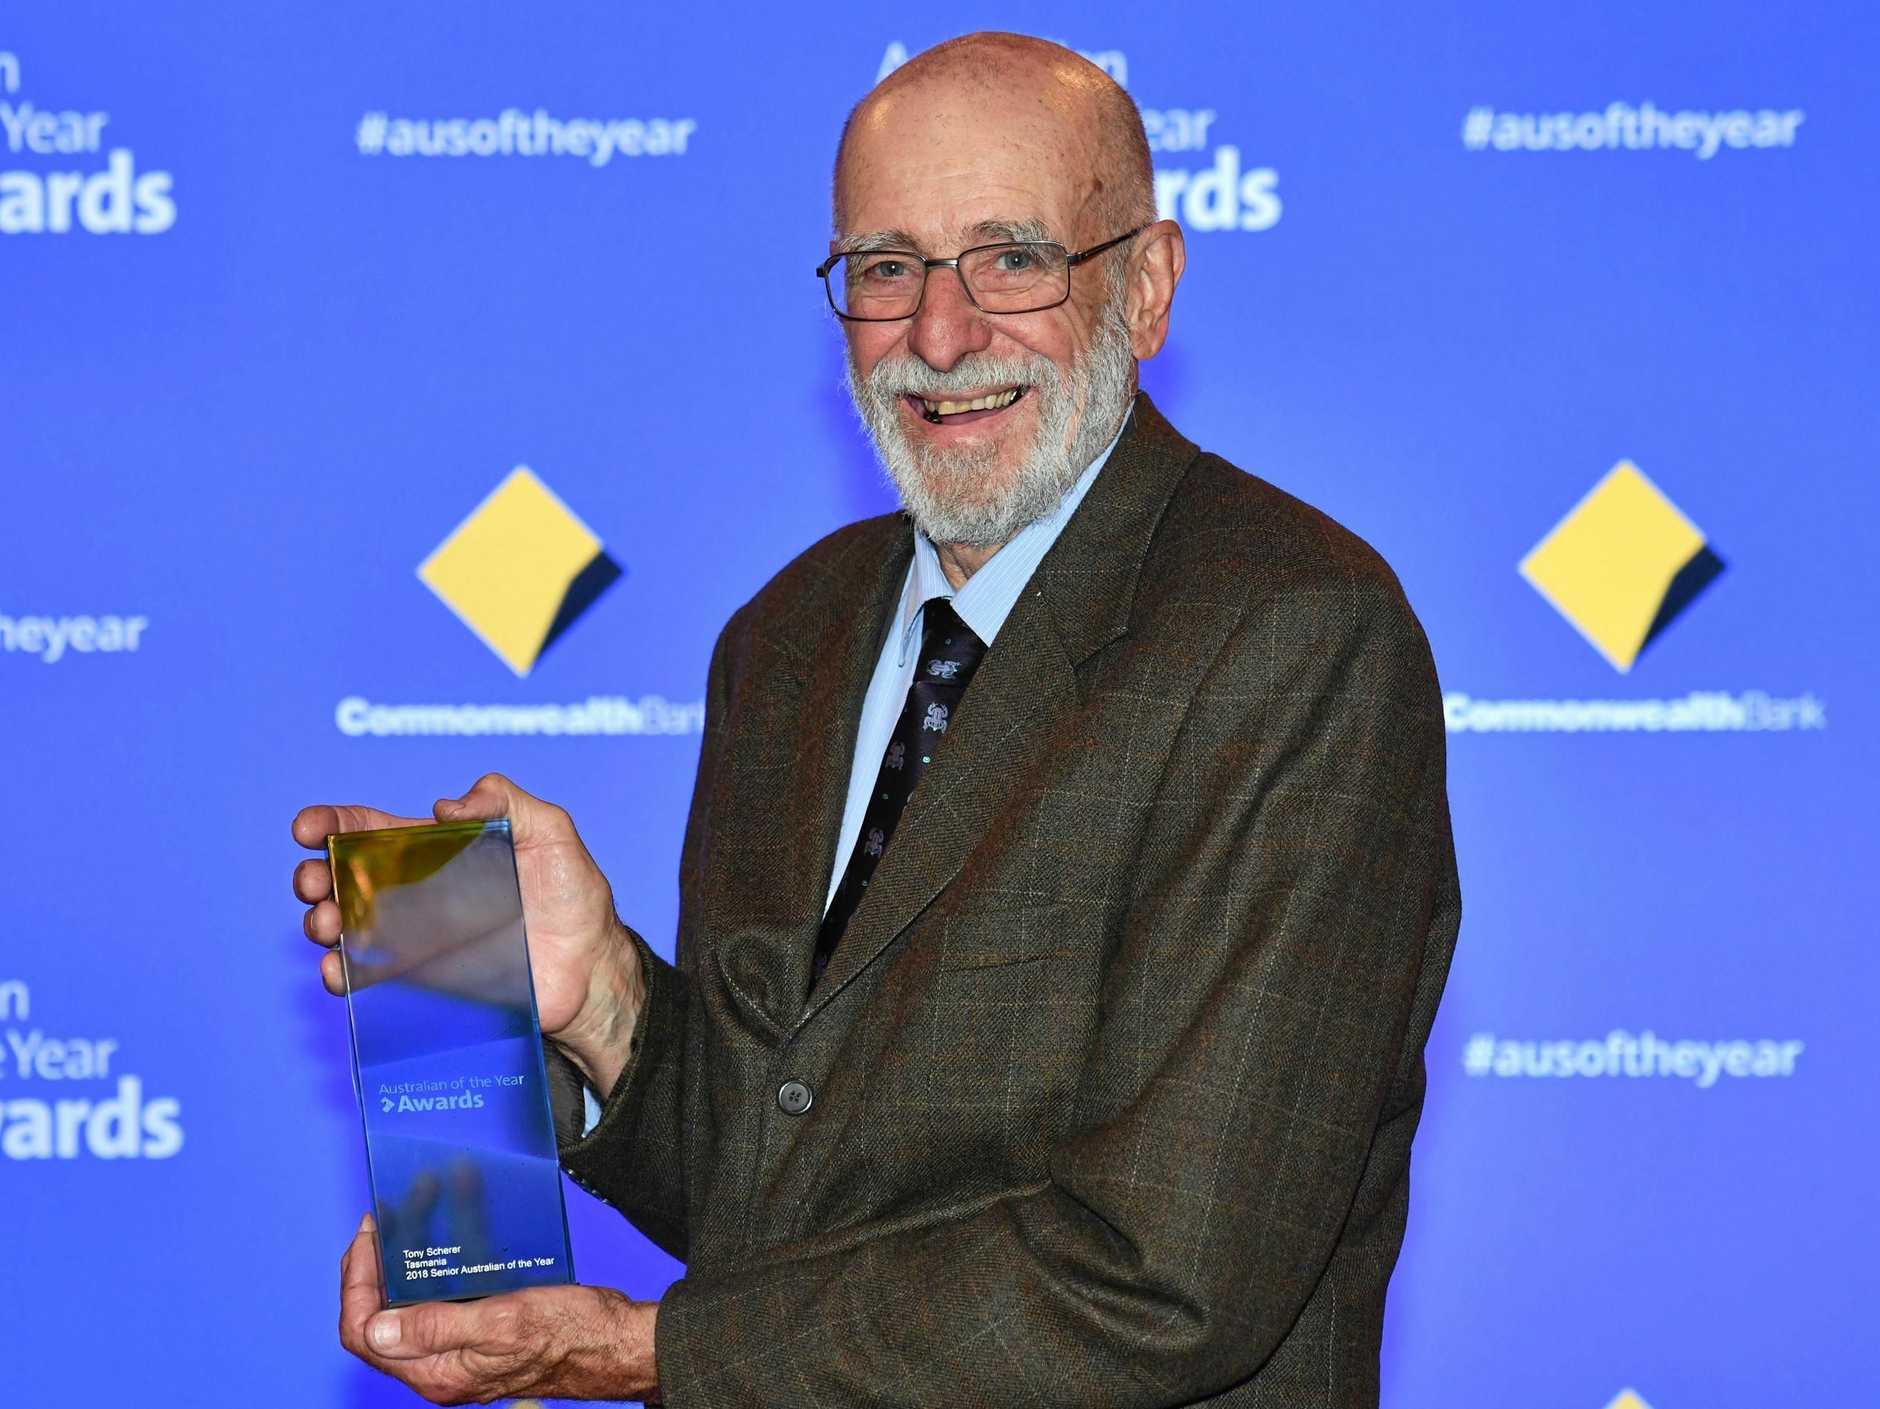 NOMINEE: Senior Australian of the Year 2018, Tasmania's nominee, Tony Scherer.